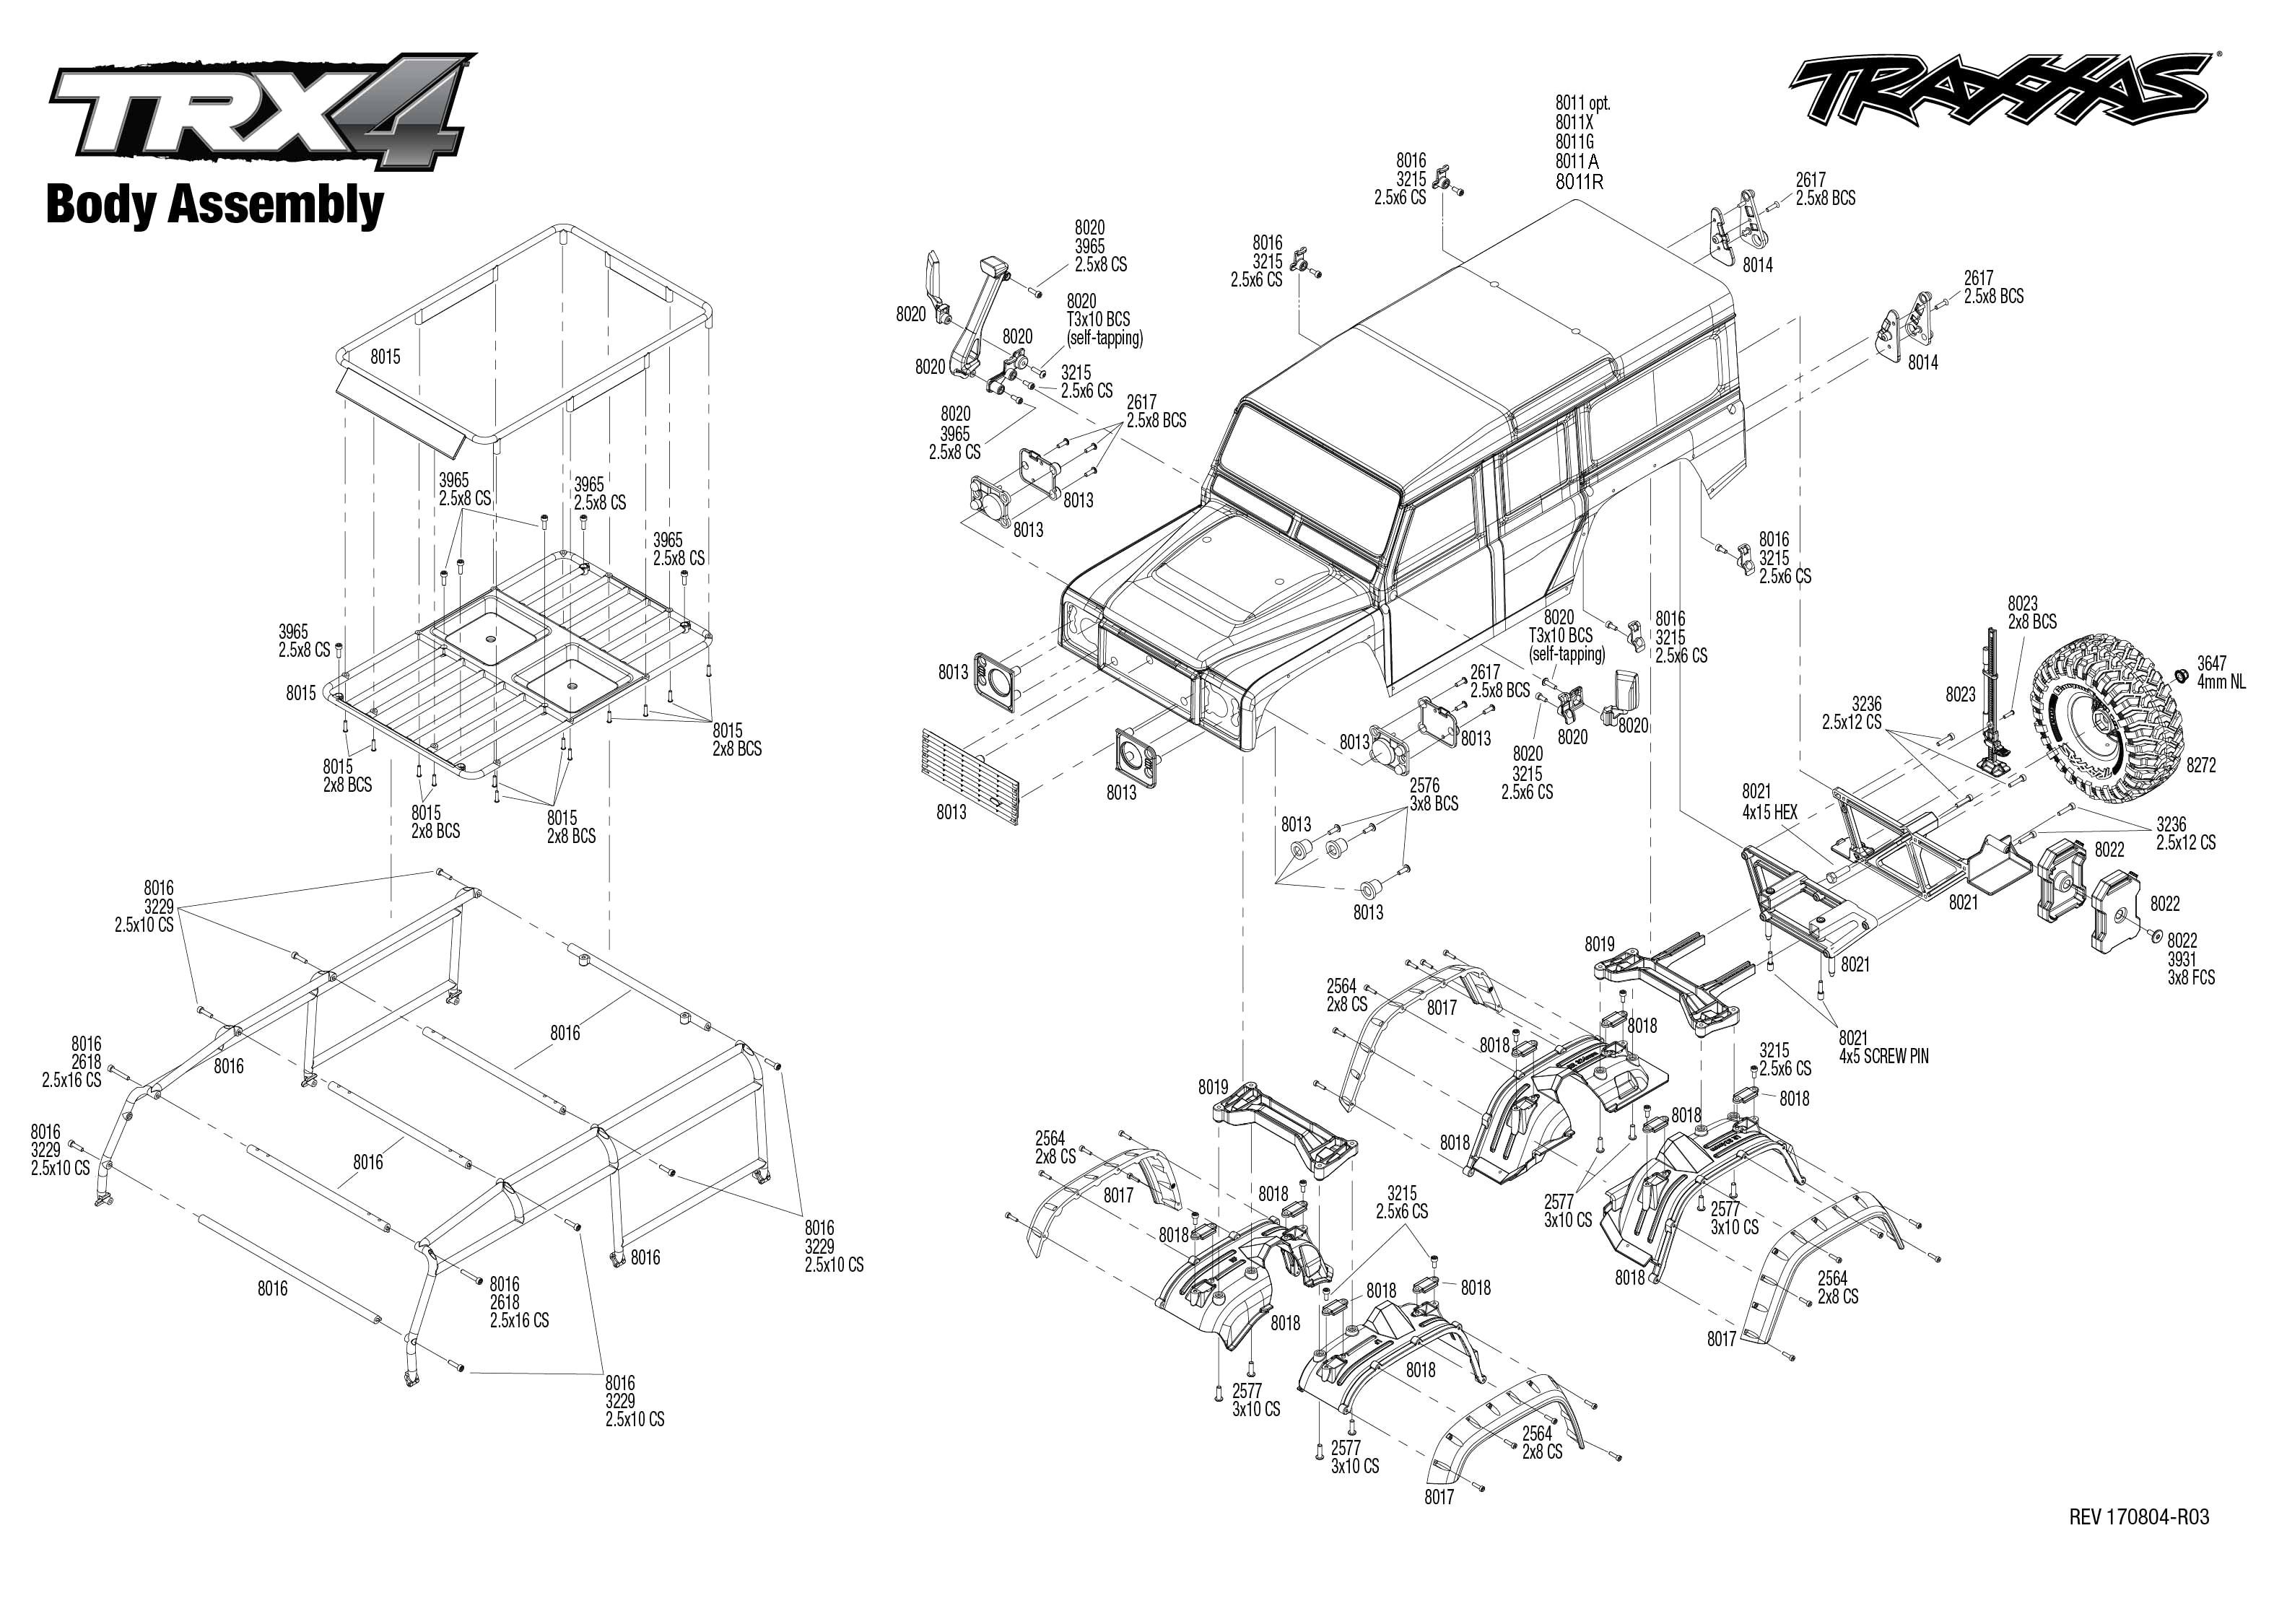 Land Rover Parts Diagram Electrical Schematics Wiring Series 3 In Depth Diagrams U2022 Manual